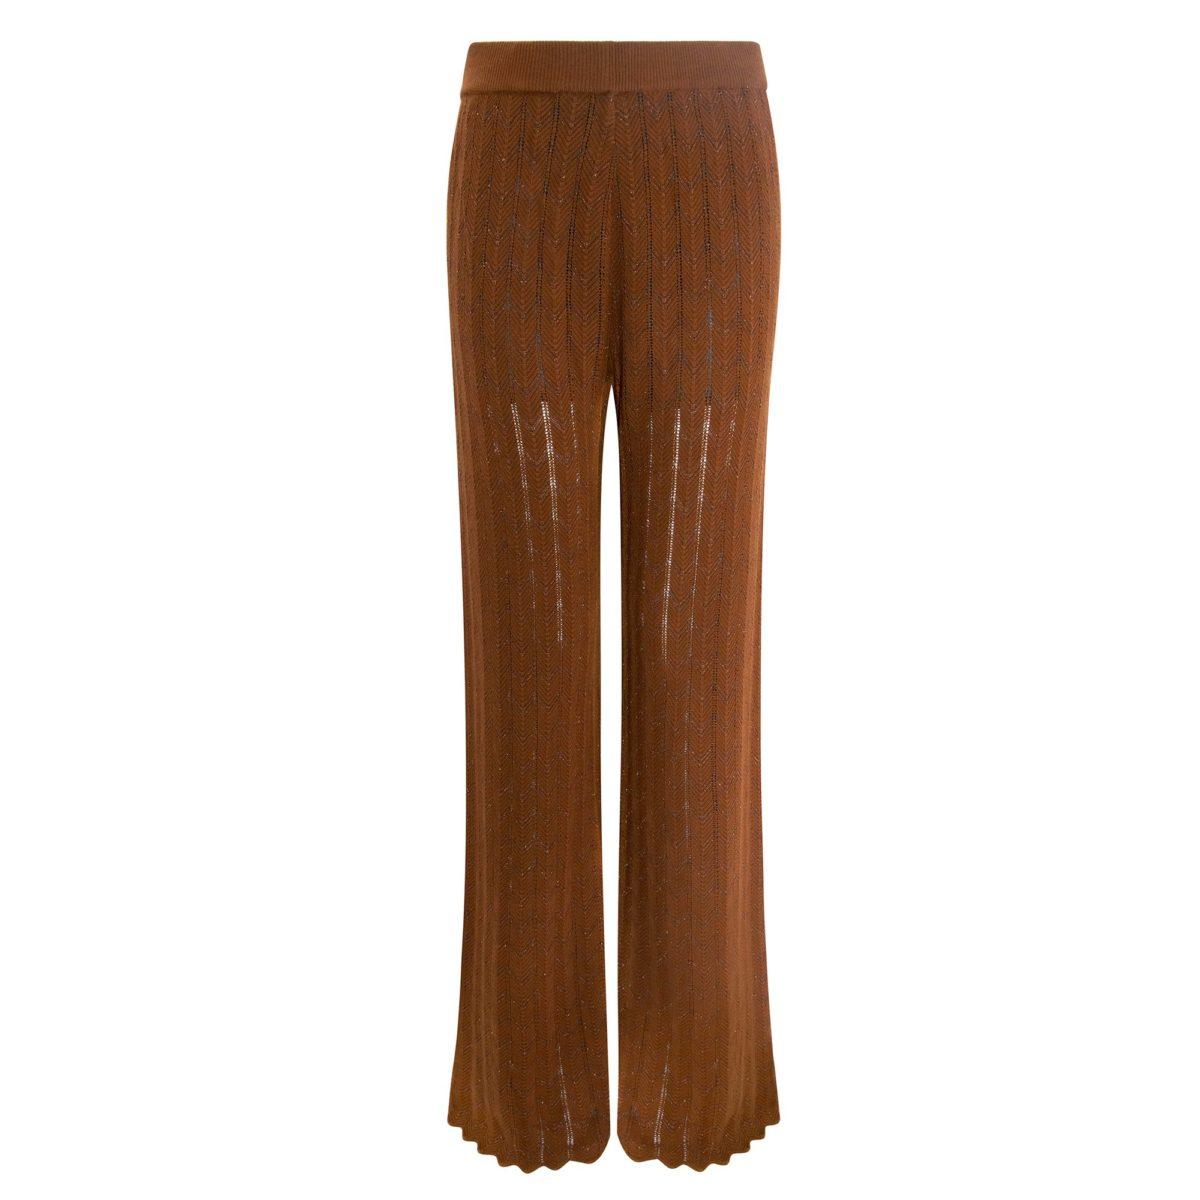 Pantalone Wide leg in maglia Rame - vista frontale | Nicla